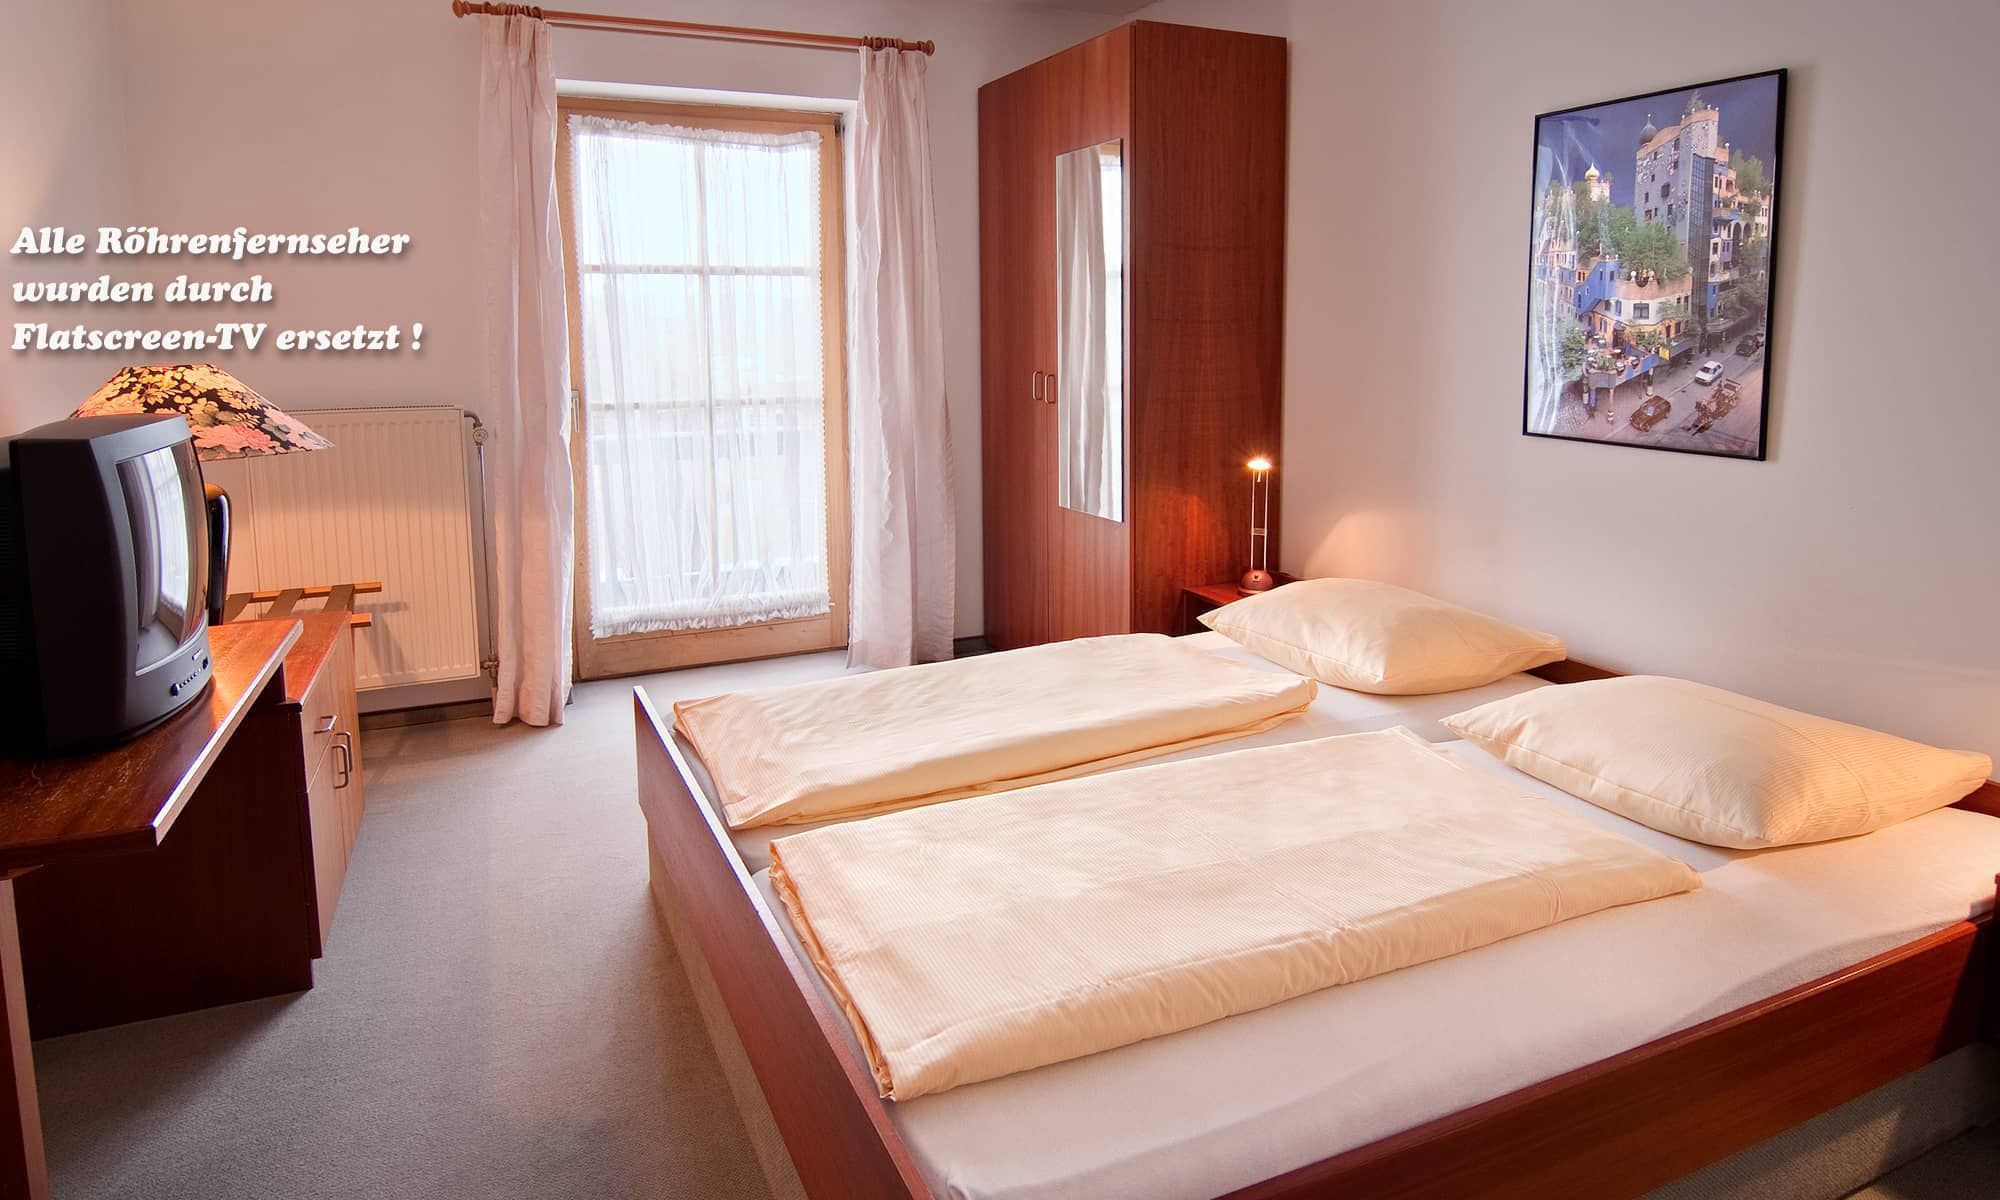 Standard Hotel Gästezimmer Gasthof Brunnlechner